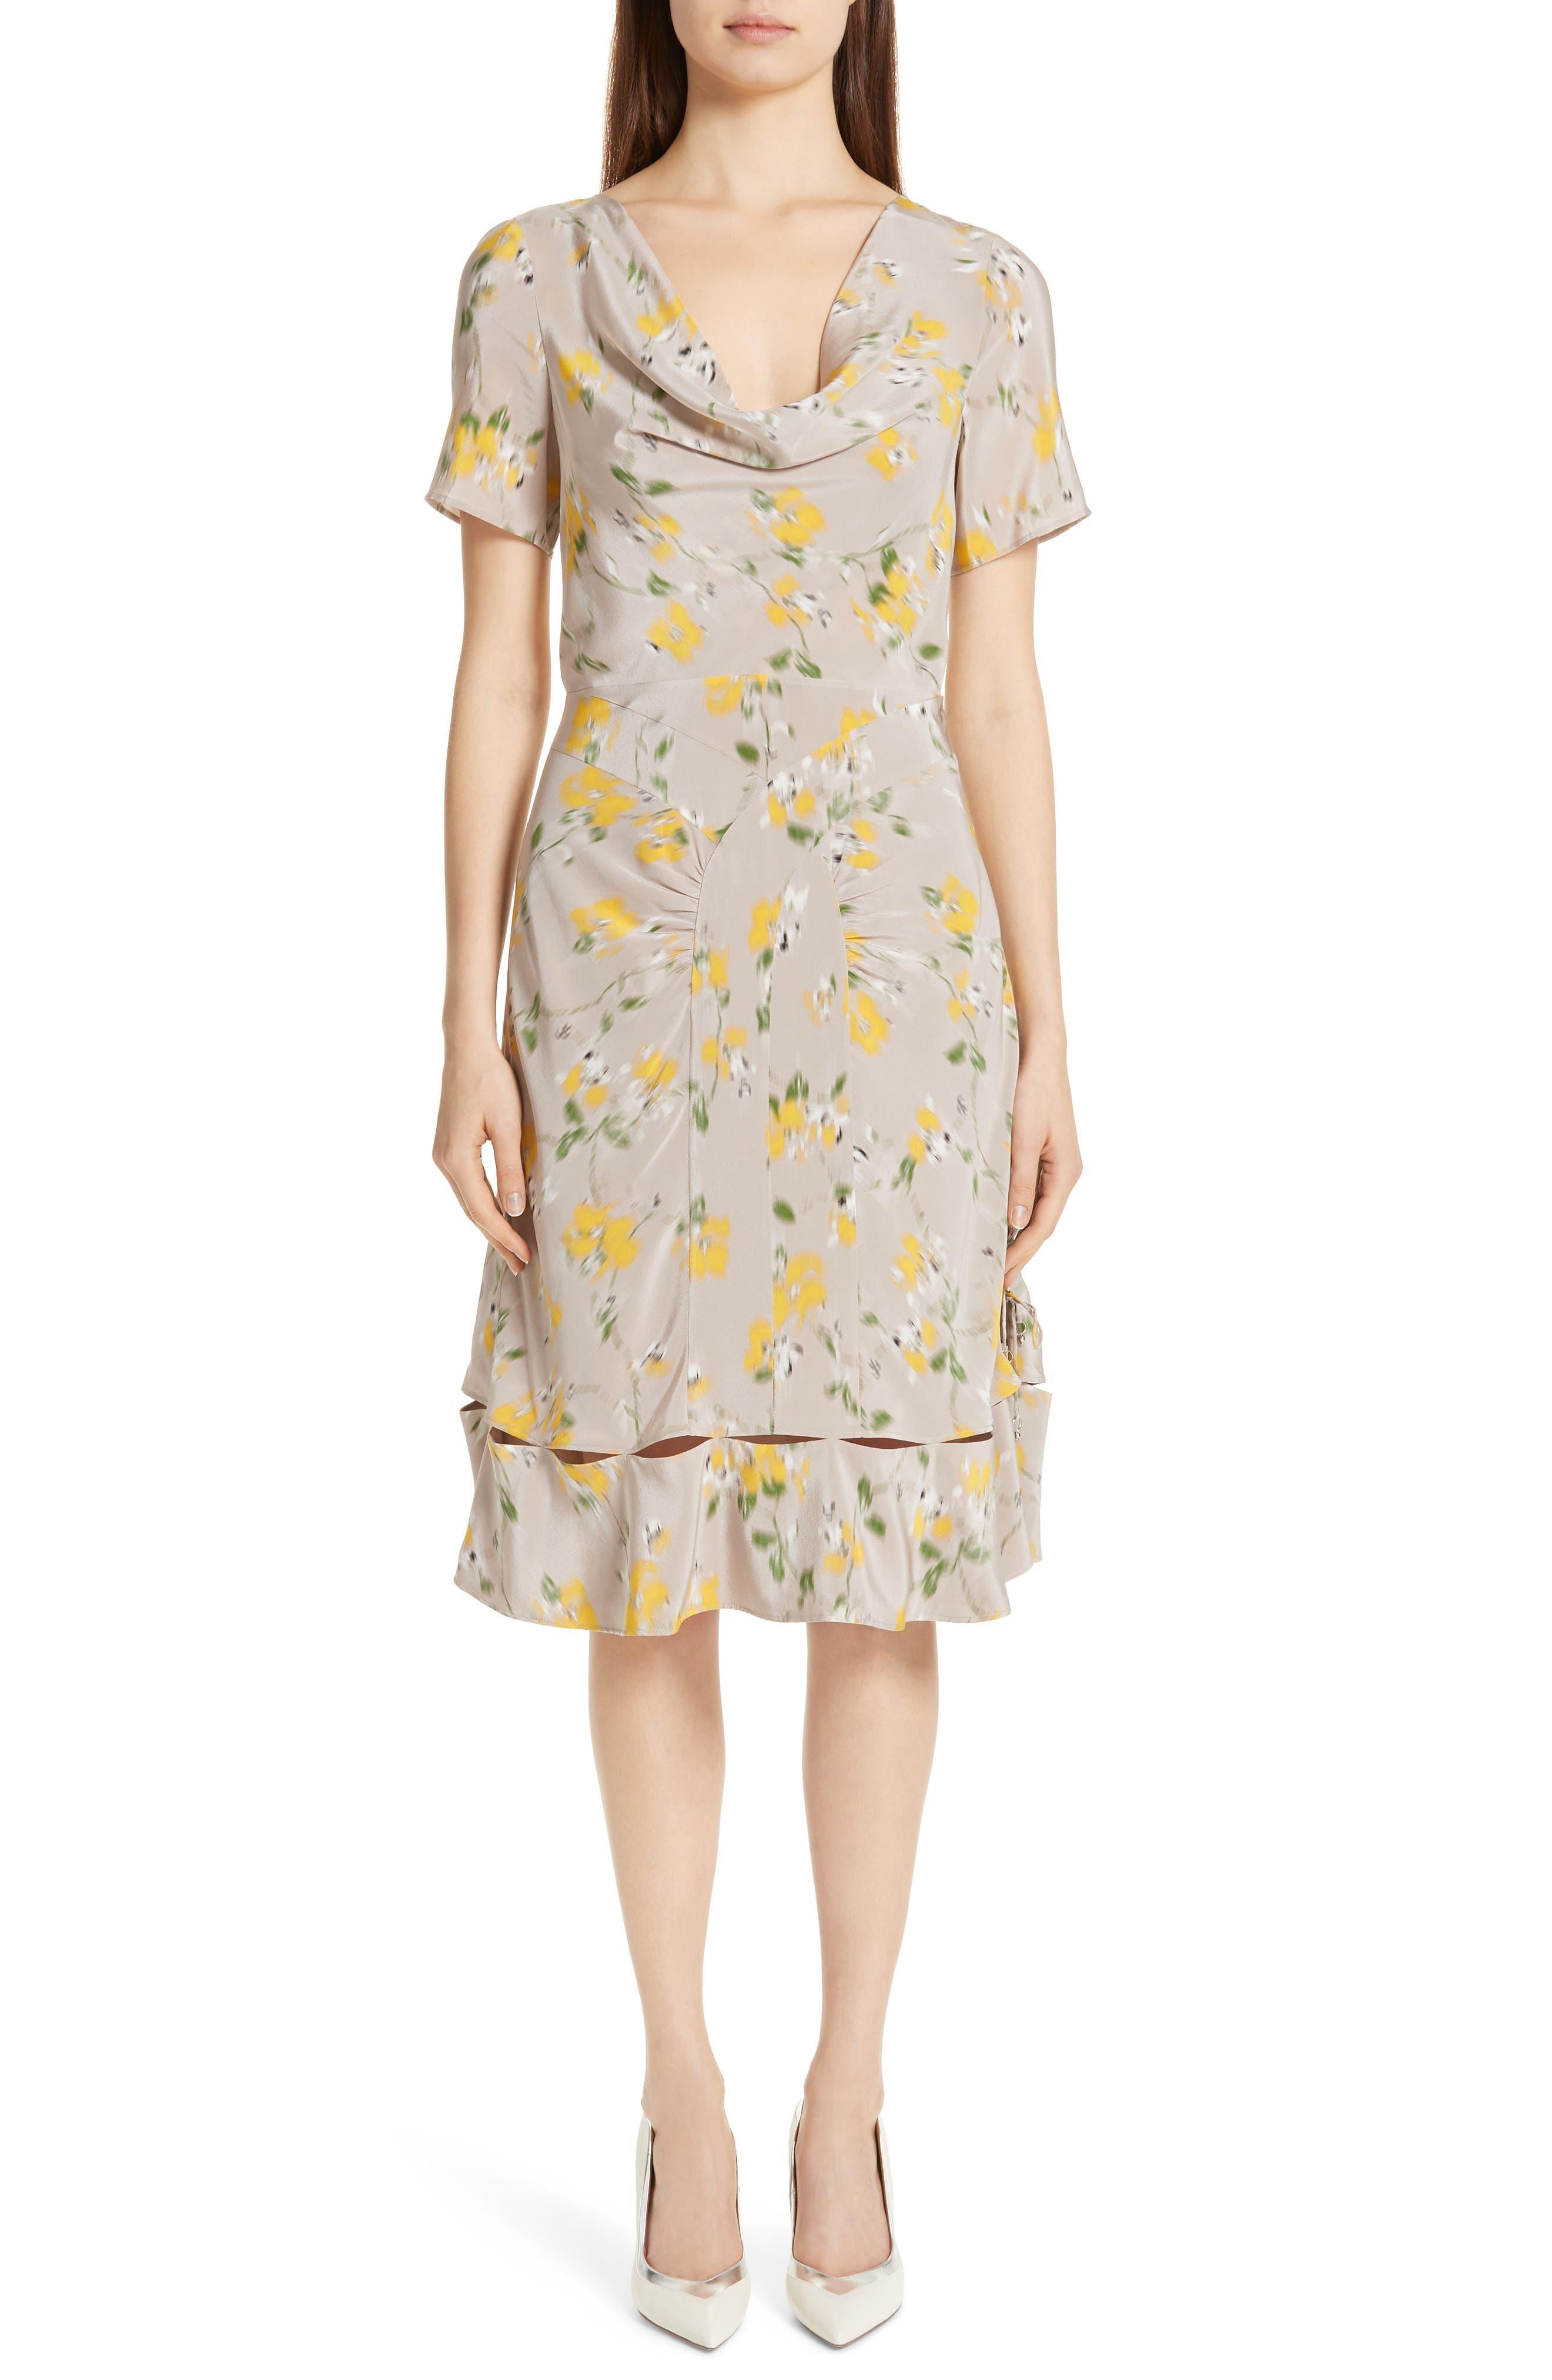 Altuzarra Cowl Neck Floral Print Silk Dress, 6 FR - Beige